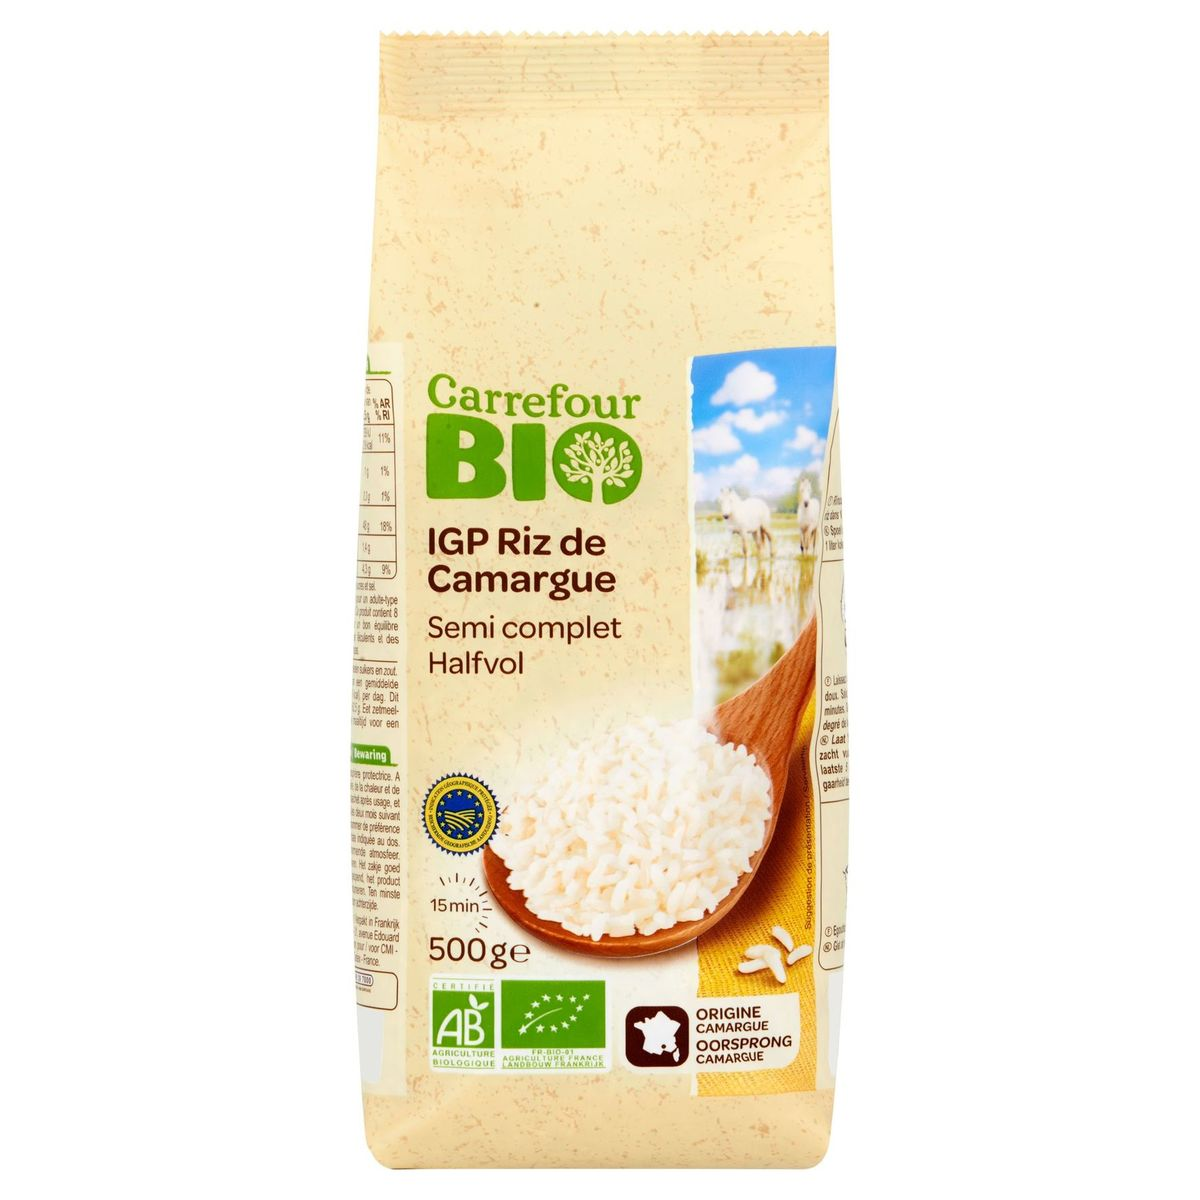 Carrefour Bio IGP Riz de Camargue Semi Complet 500 g